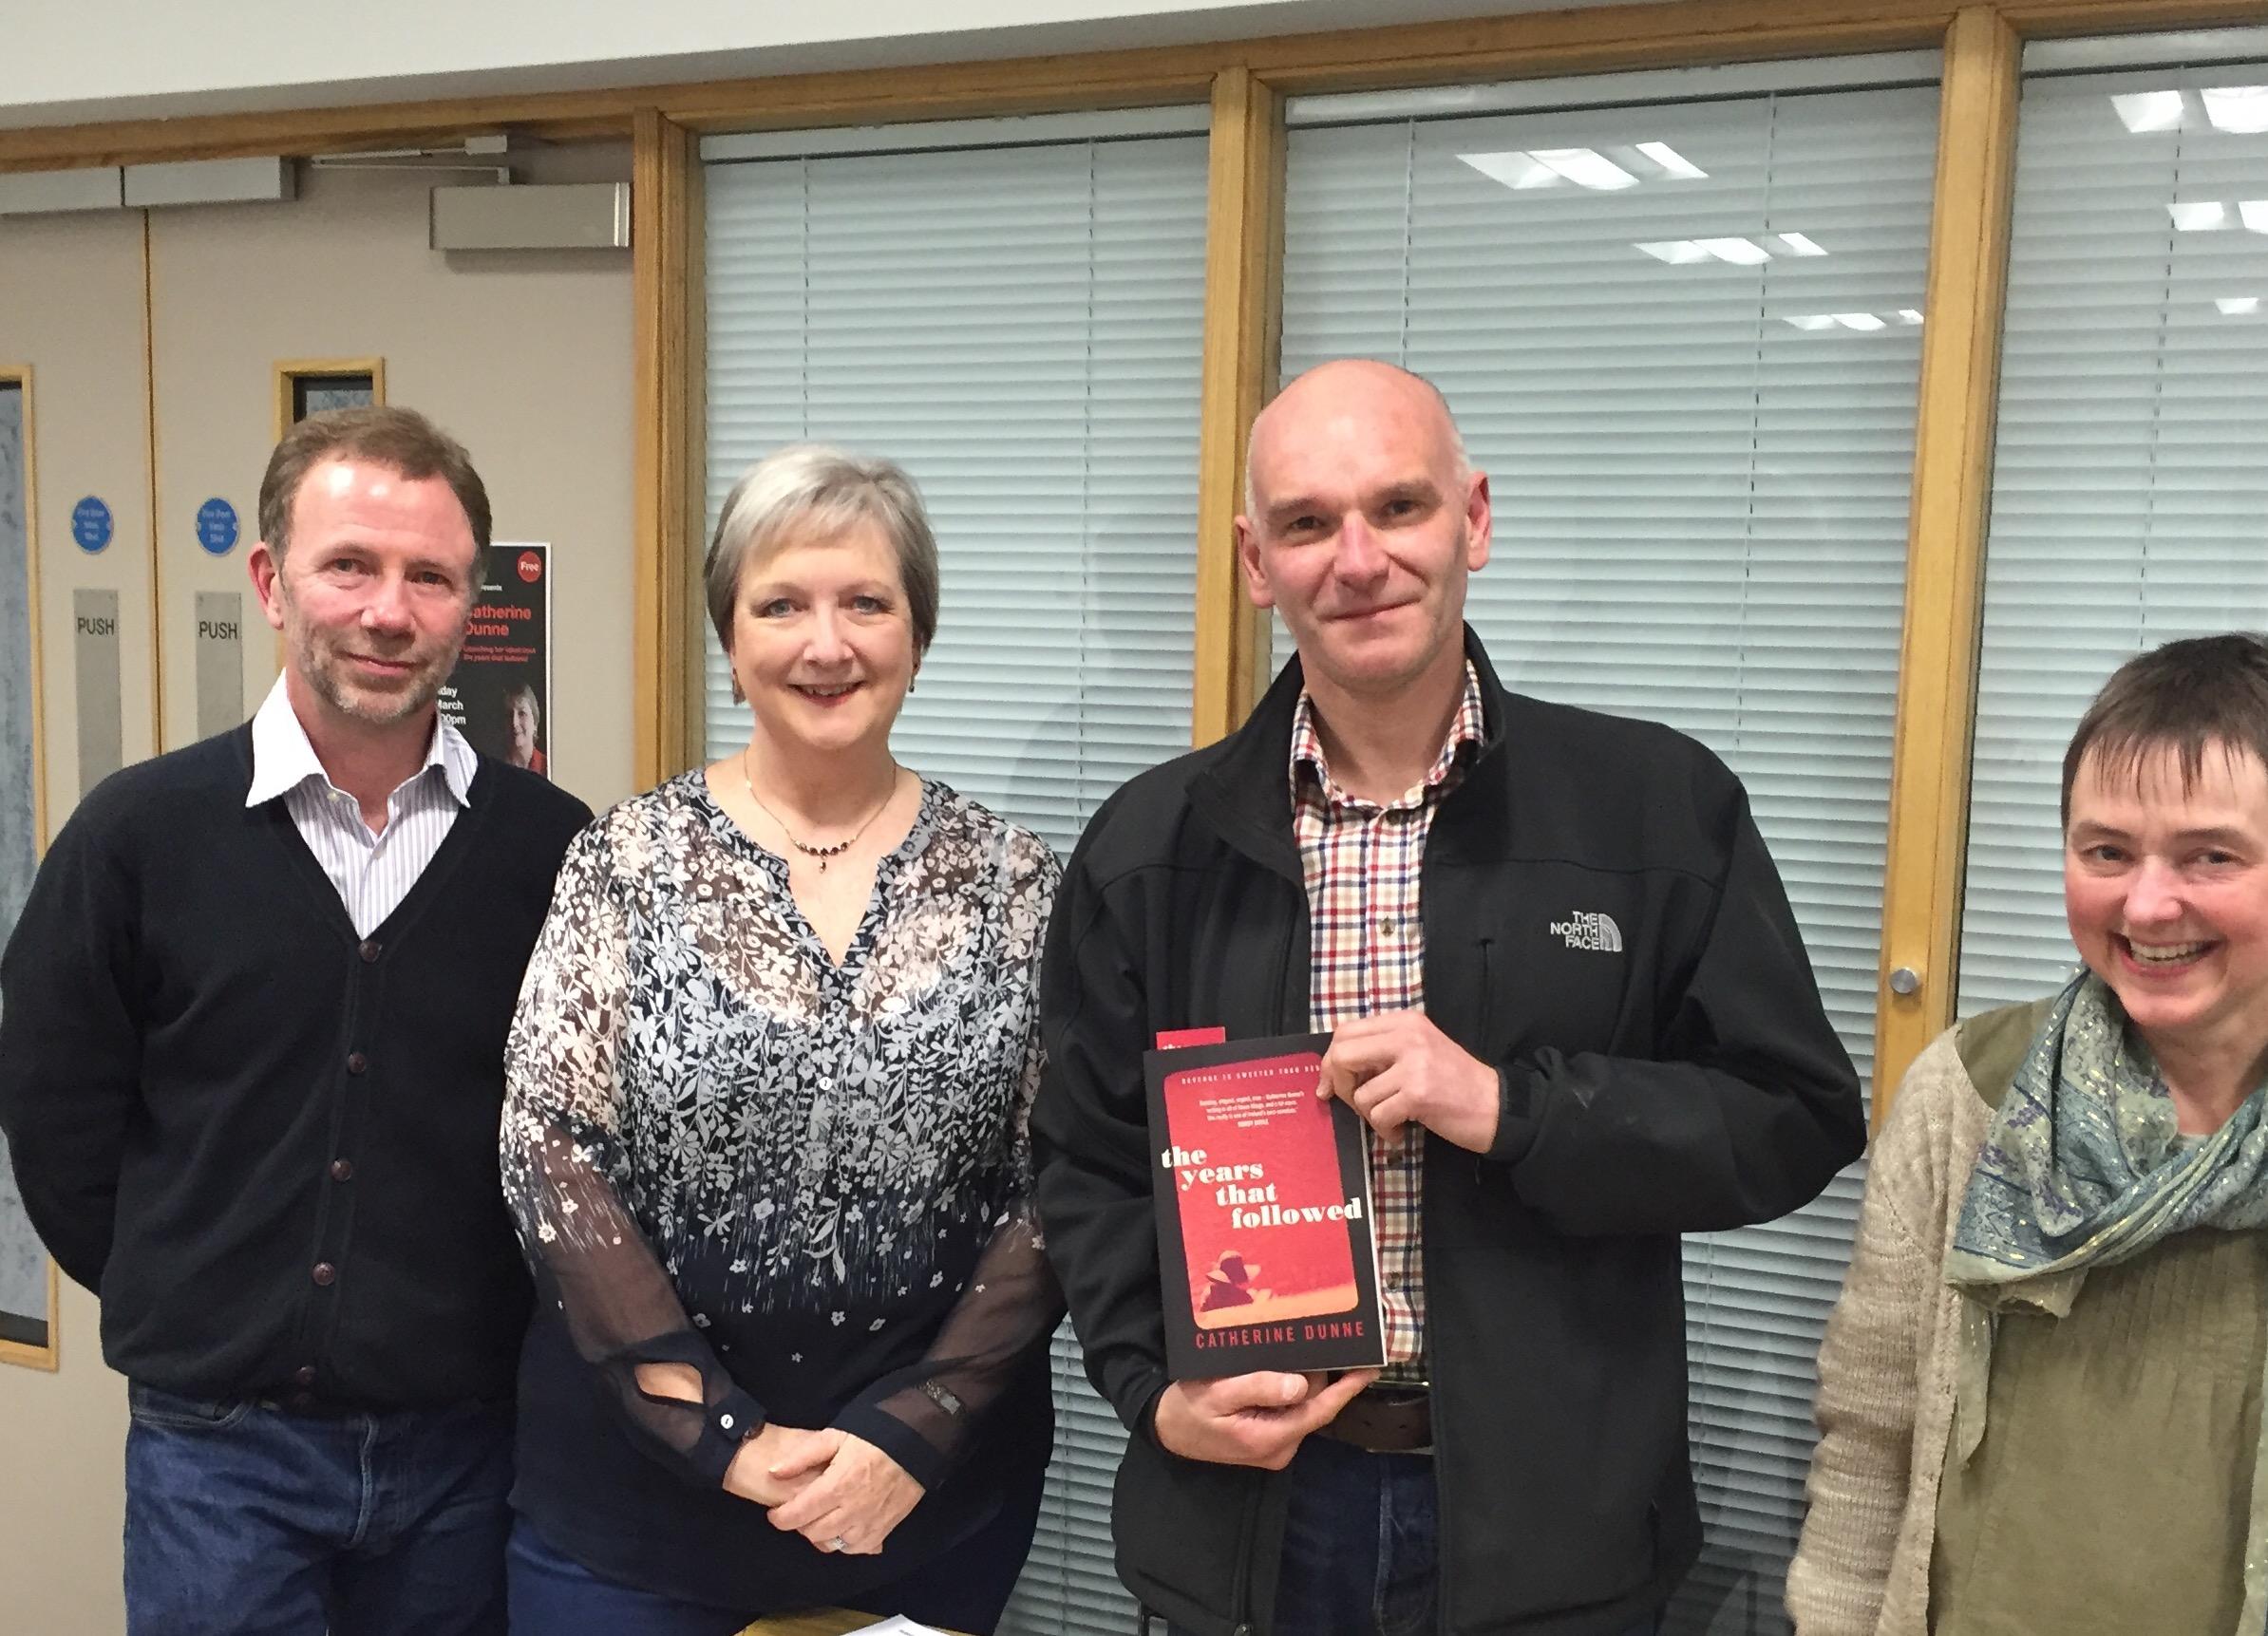 The Years that Followed / Un Terribile Amore - Nord Irlanda - Carrickfergus Launch 4 David Torrens + Claudia of No Alibis Bookshop David Adamson of Macmillan on left